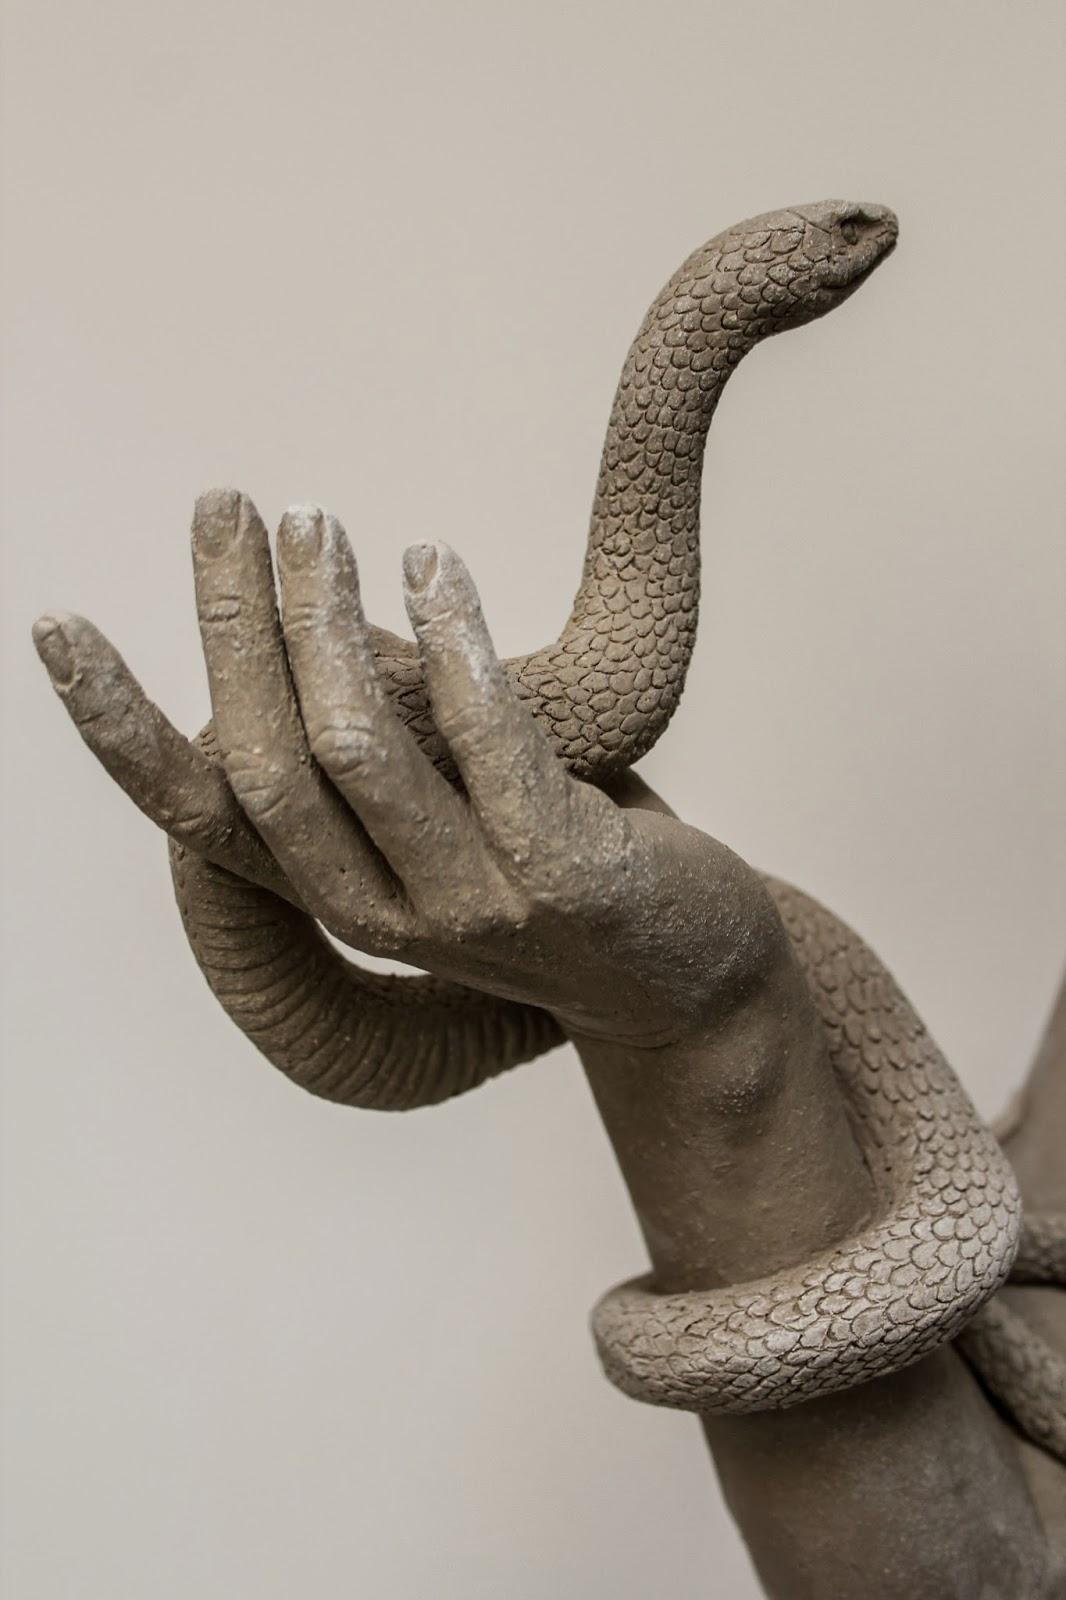 Colin and Kristine Poole – Deer Humanimal sculptures